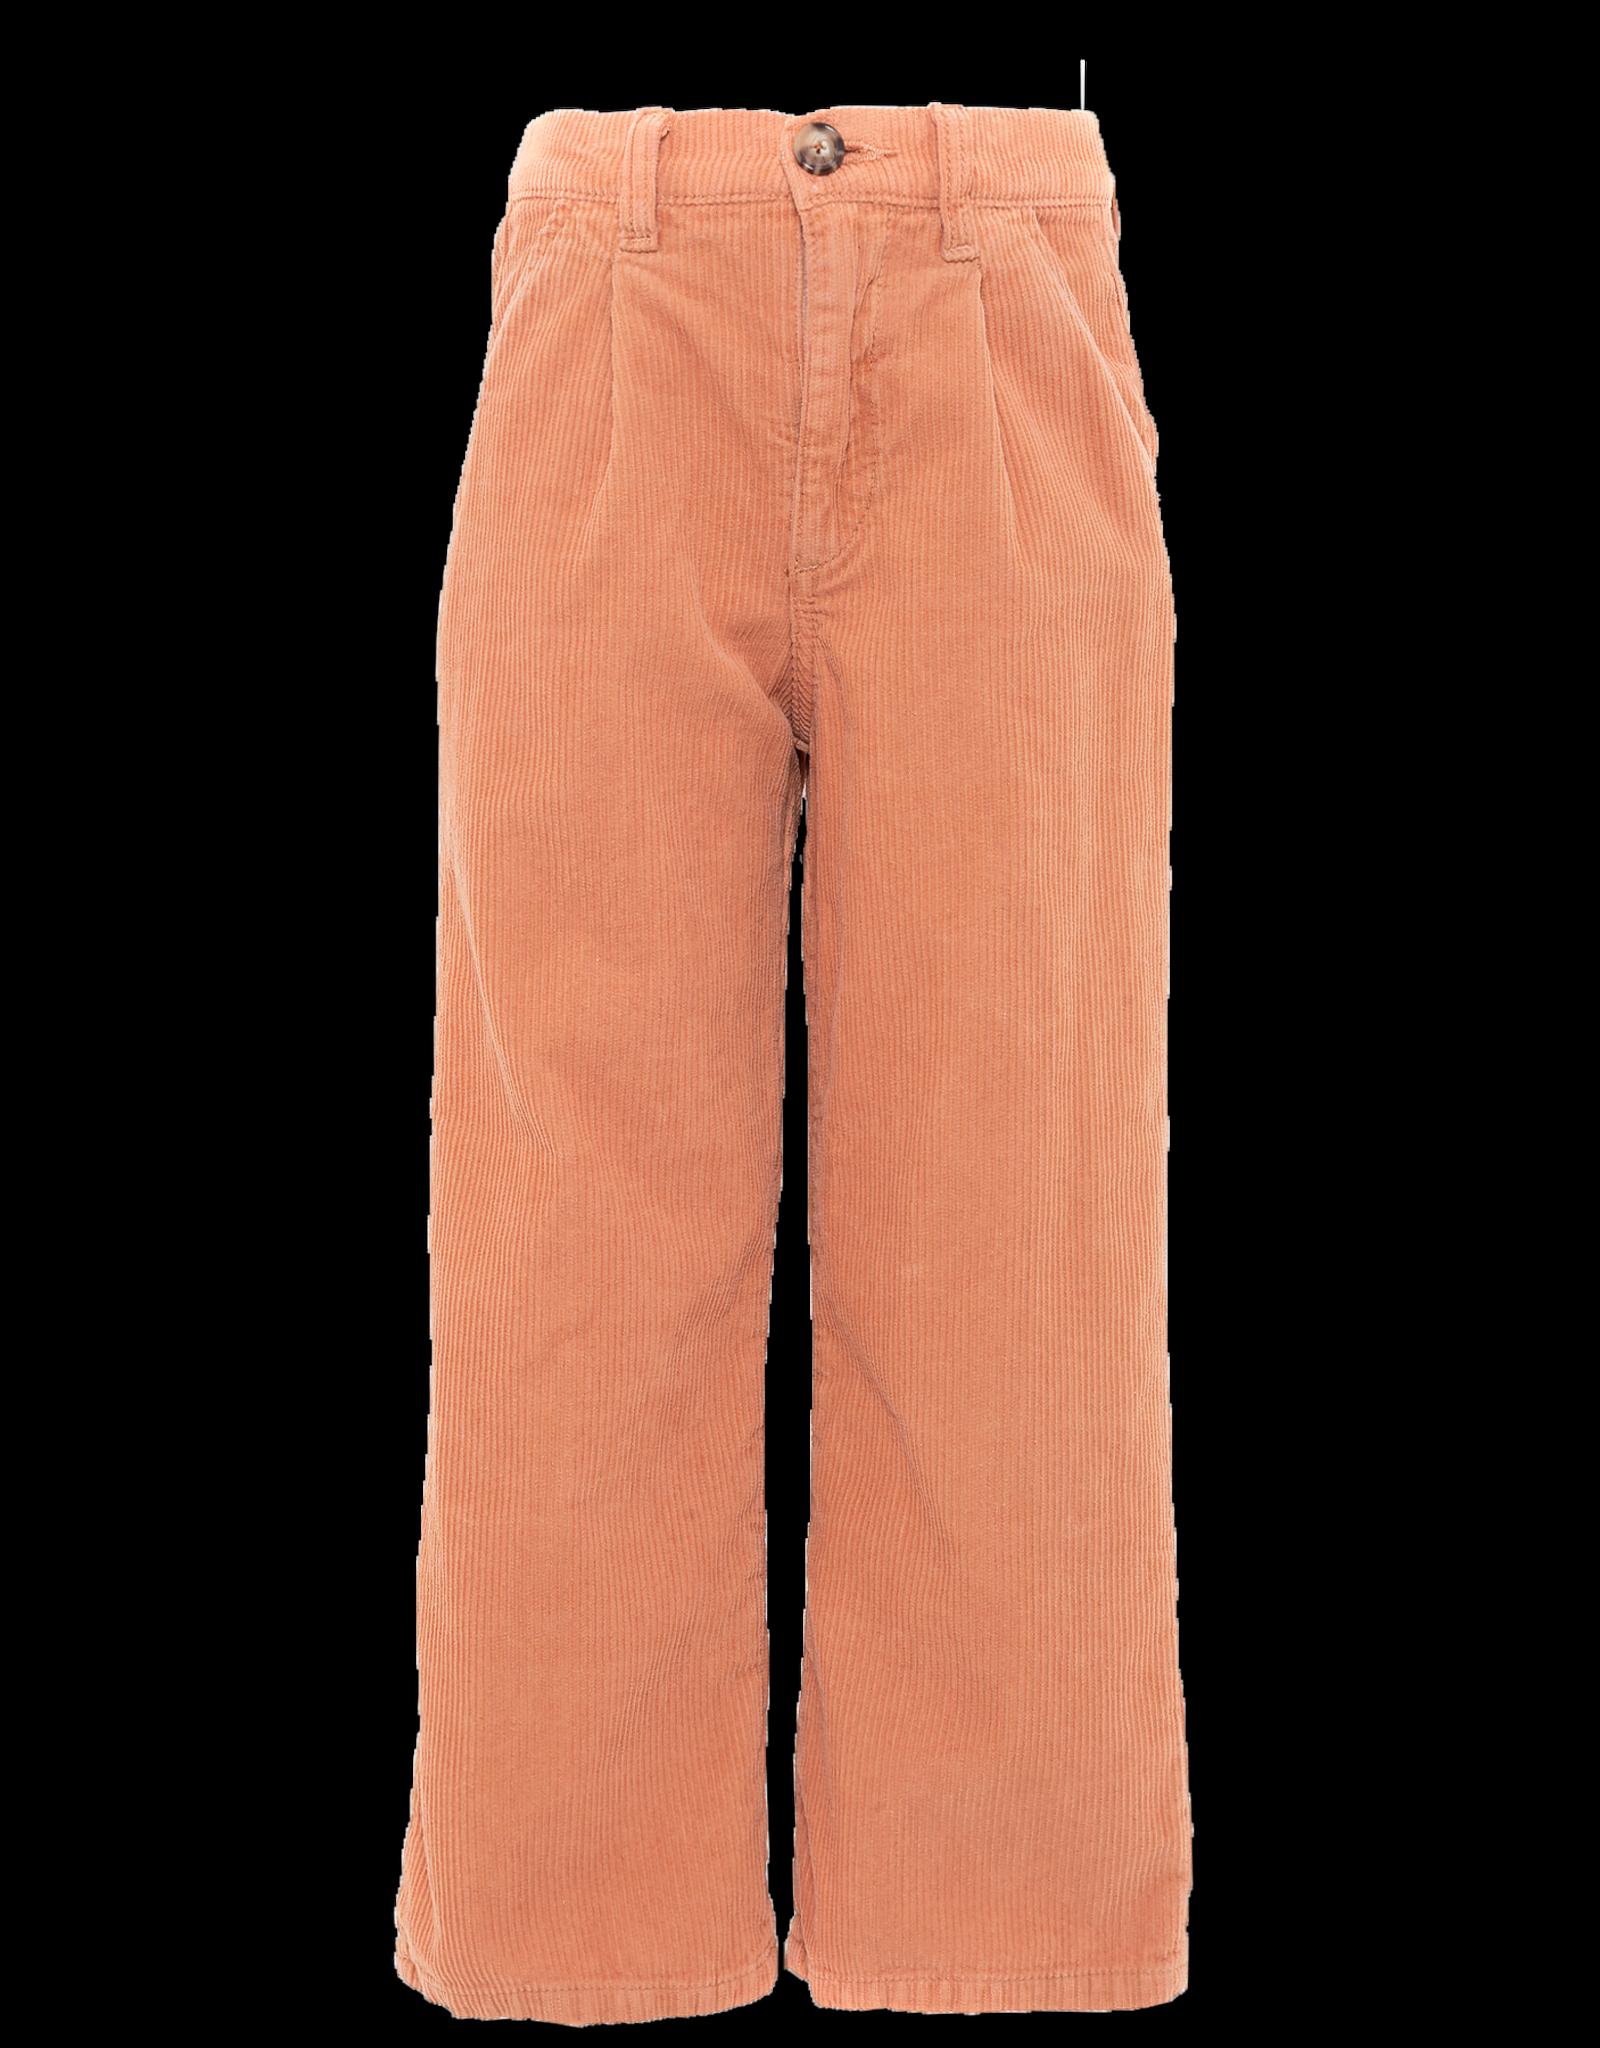 AMERICAN OUTFITTERS karen corduroy pants Cinnamon